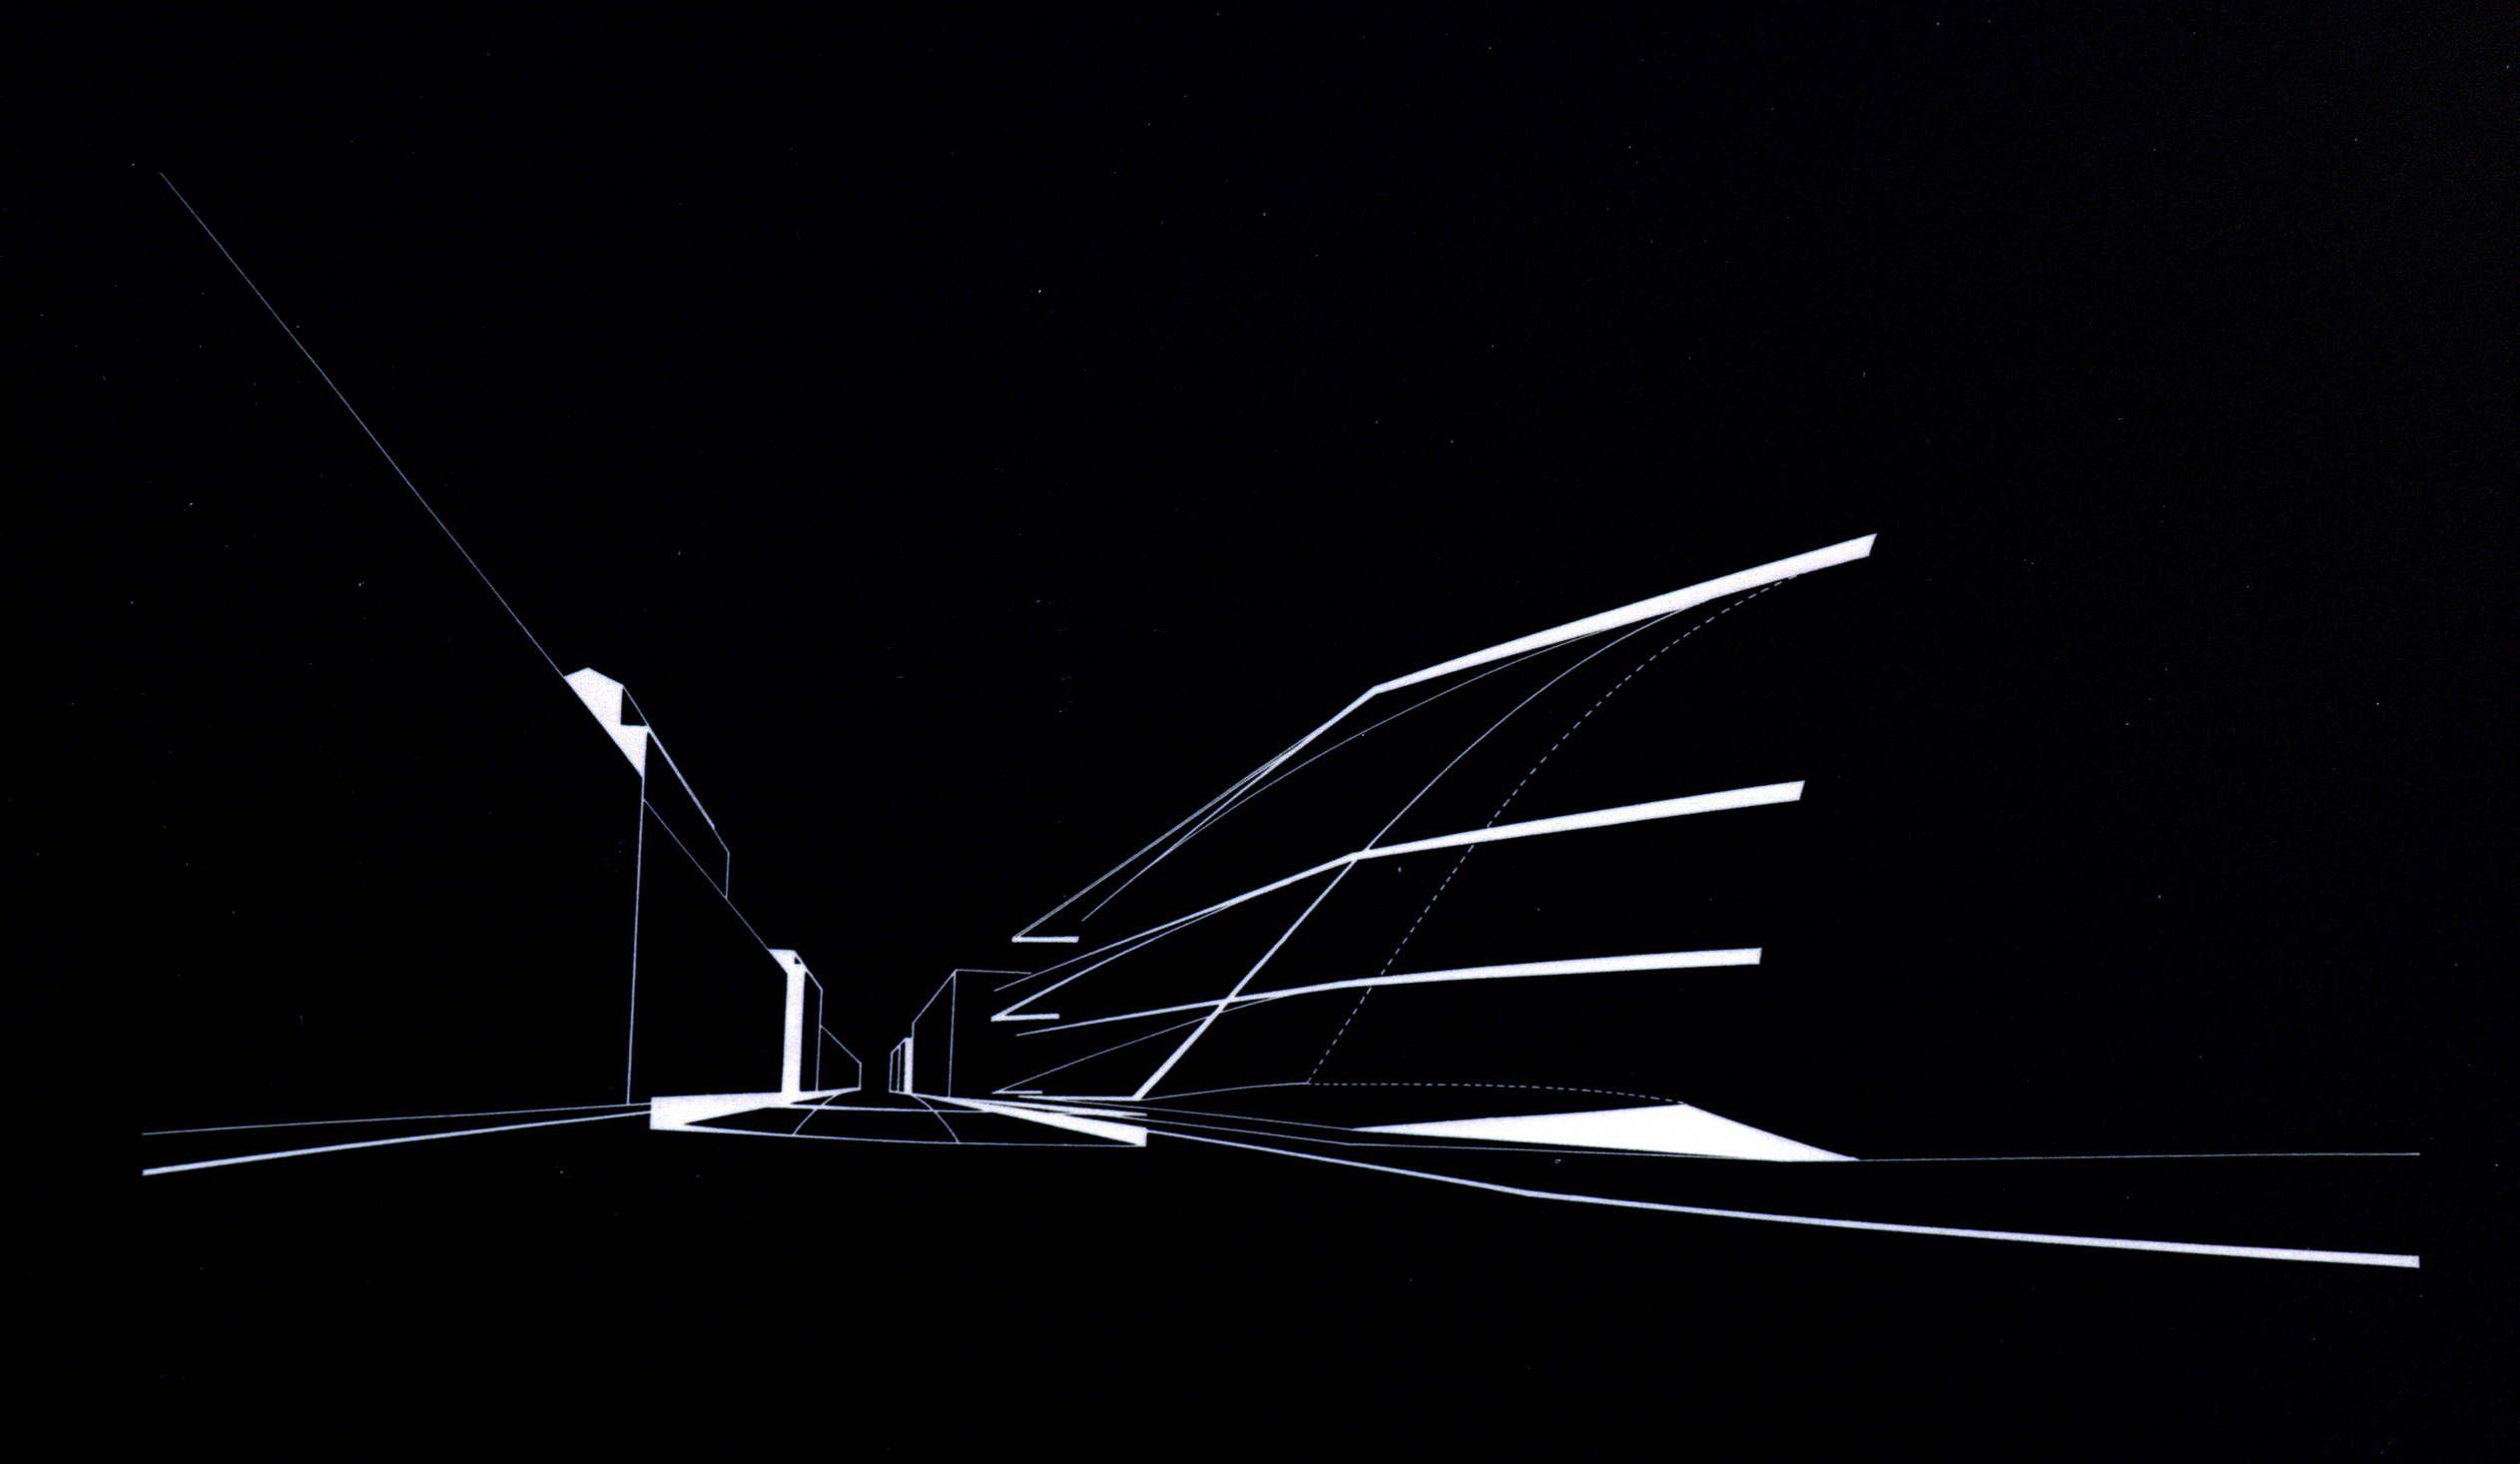 Zaha Hadid Style Perspective White On Black